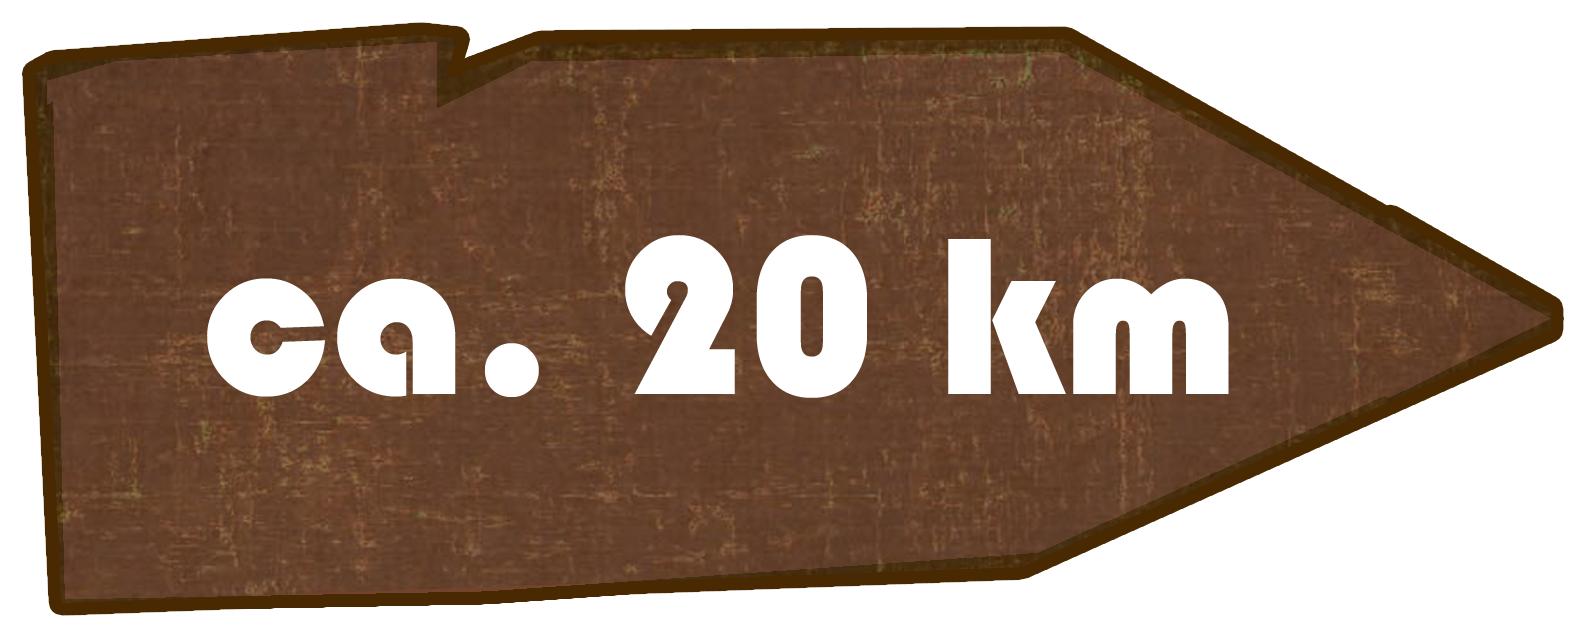 Kilometer Obercunnersdorf - Eibau - Ruppersdorf - Herrenhut - Obercunnersdorf